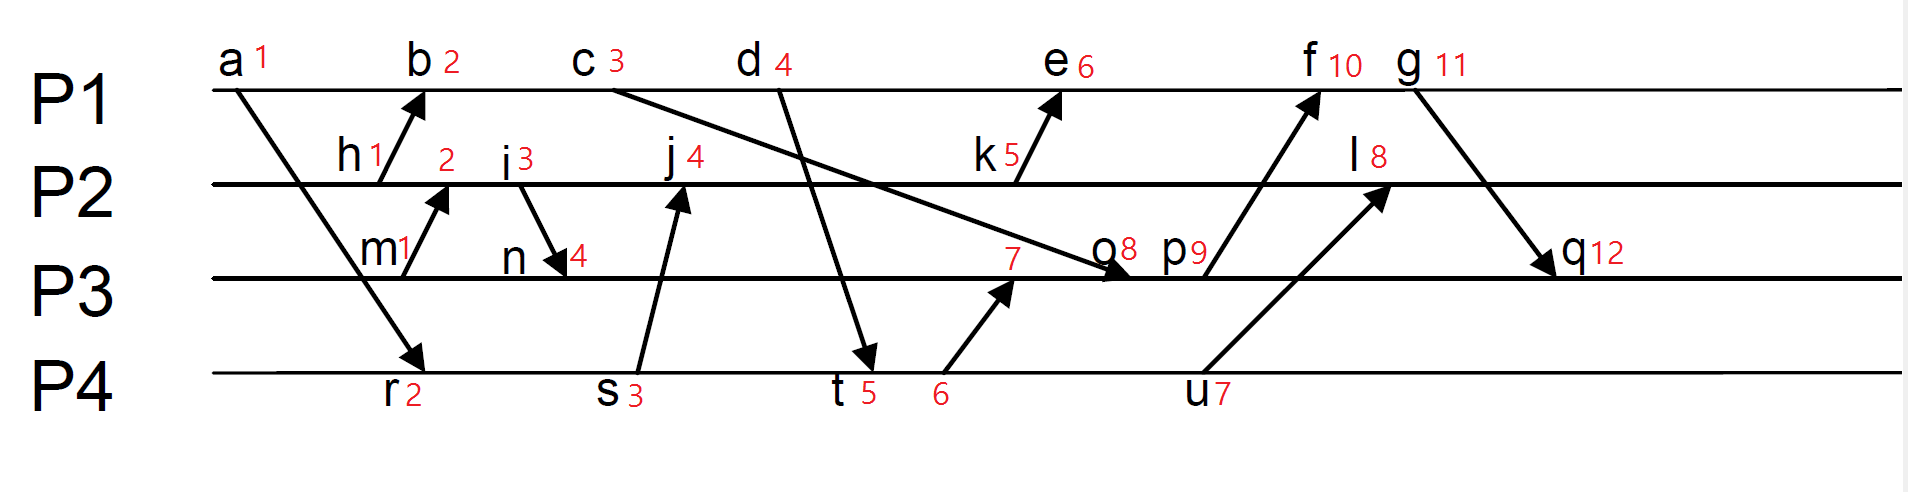 Lamport-Clock-Timestamp